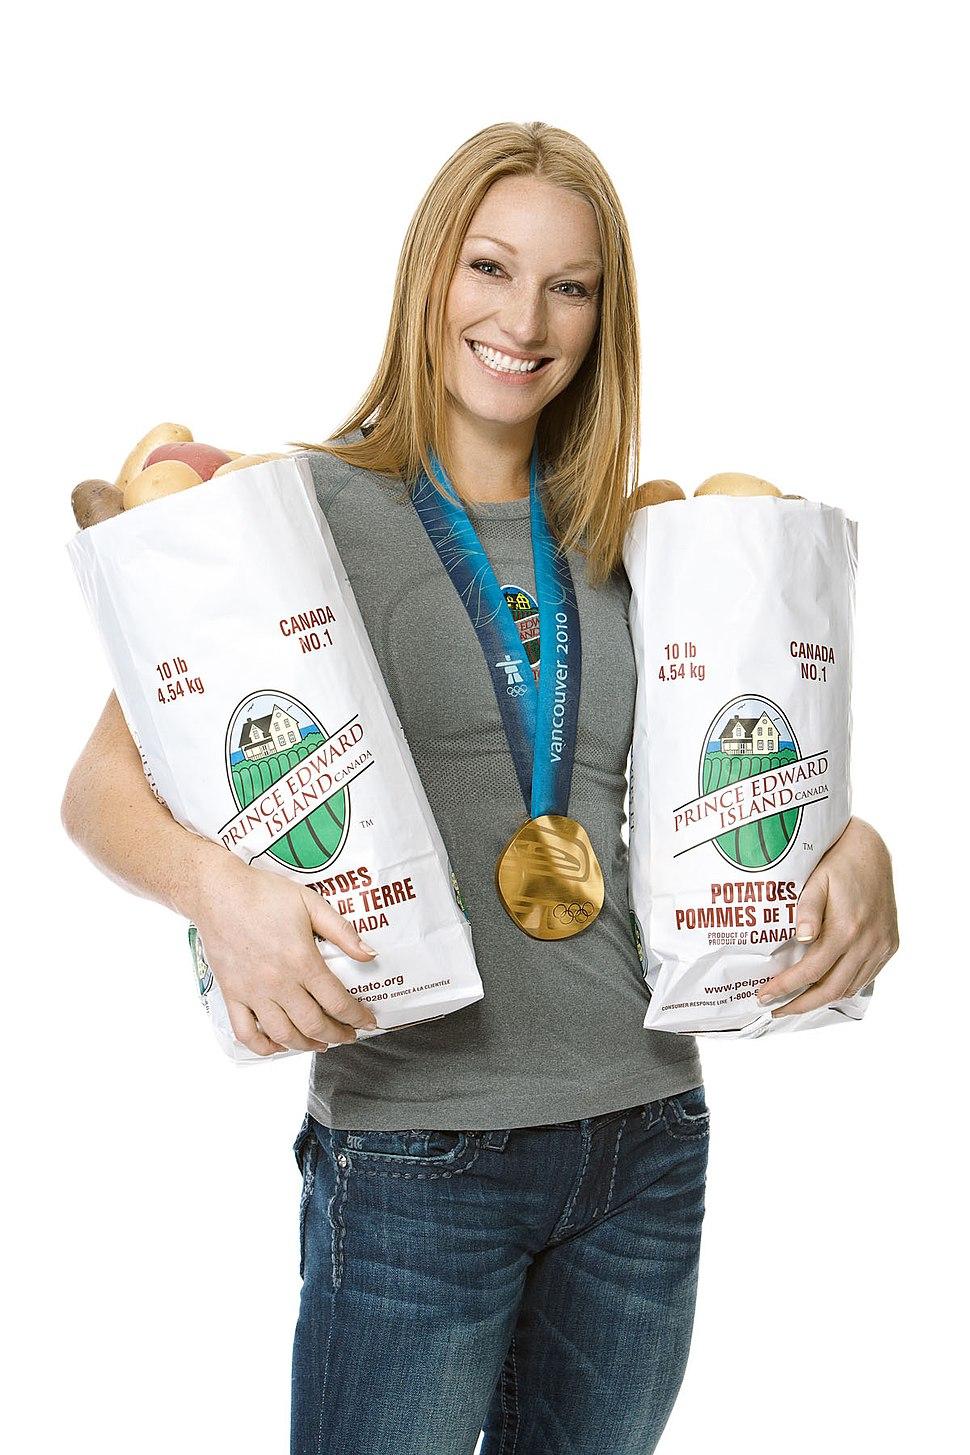 Heather Moyse, PEI Potatoes Brand Ambassador